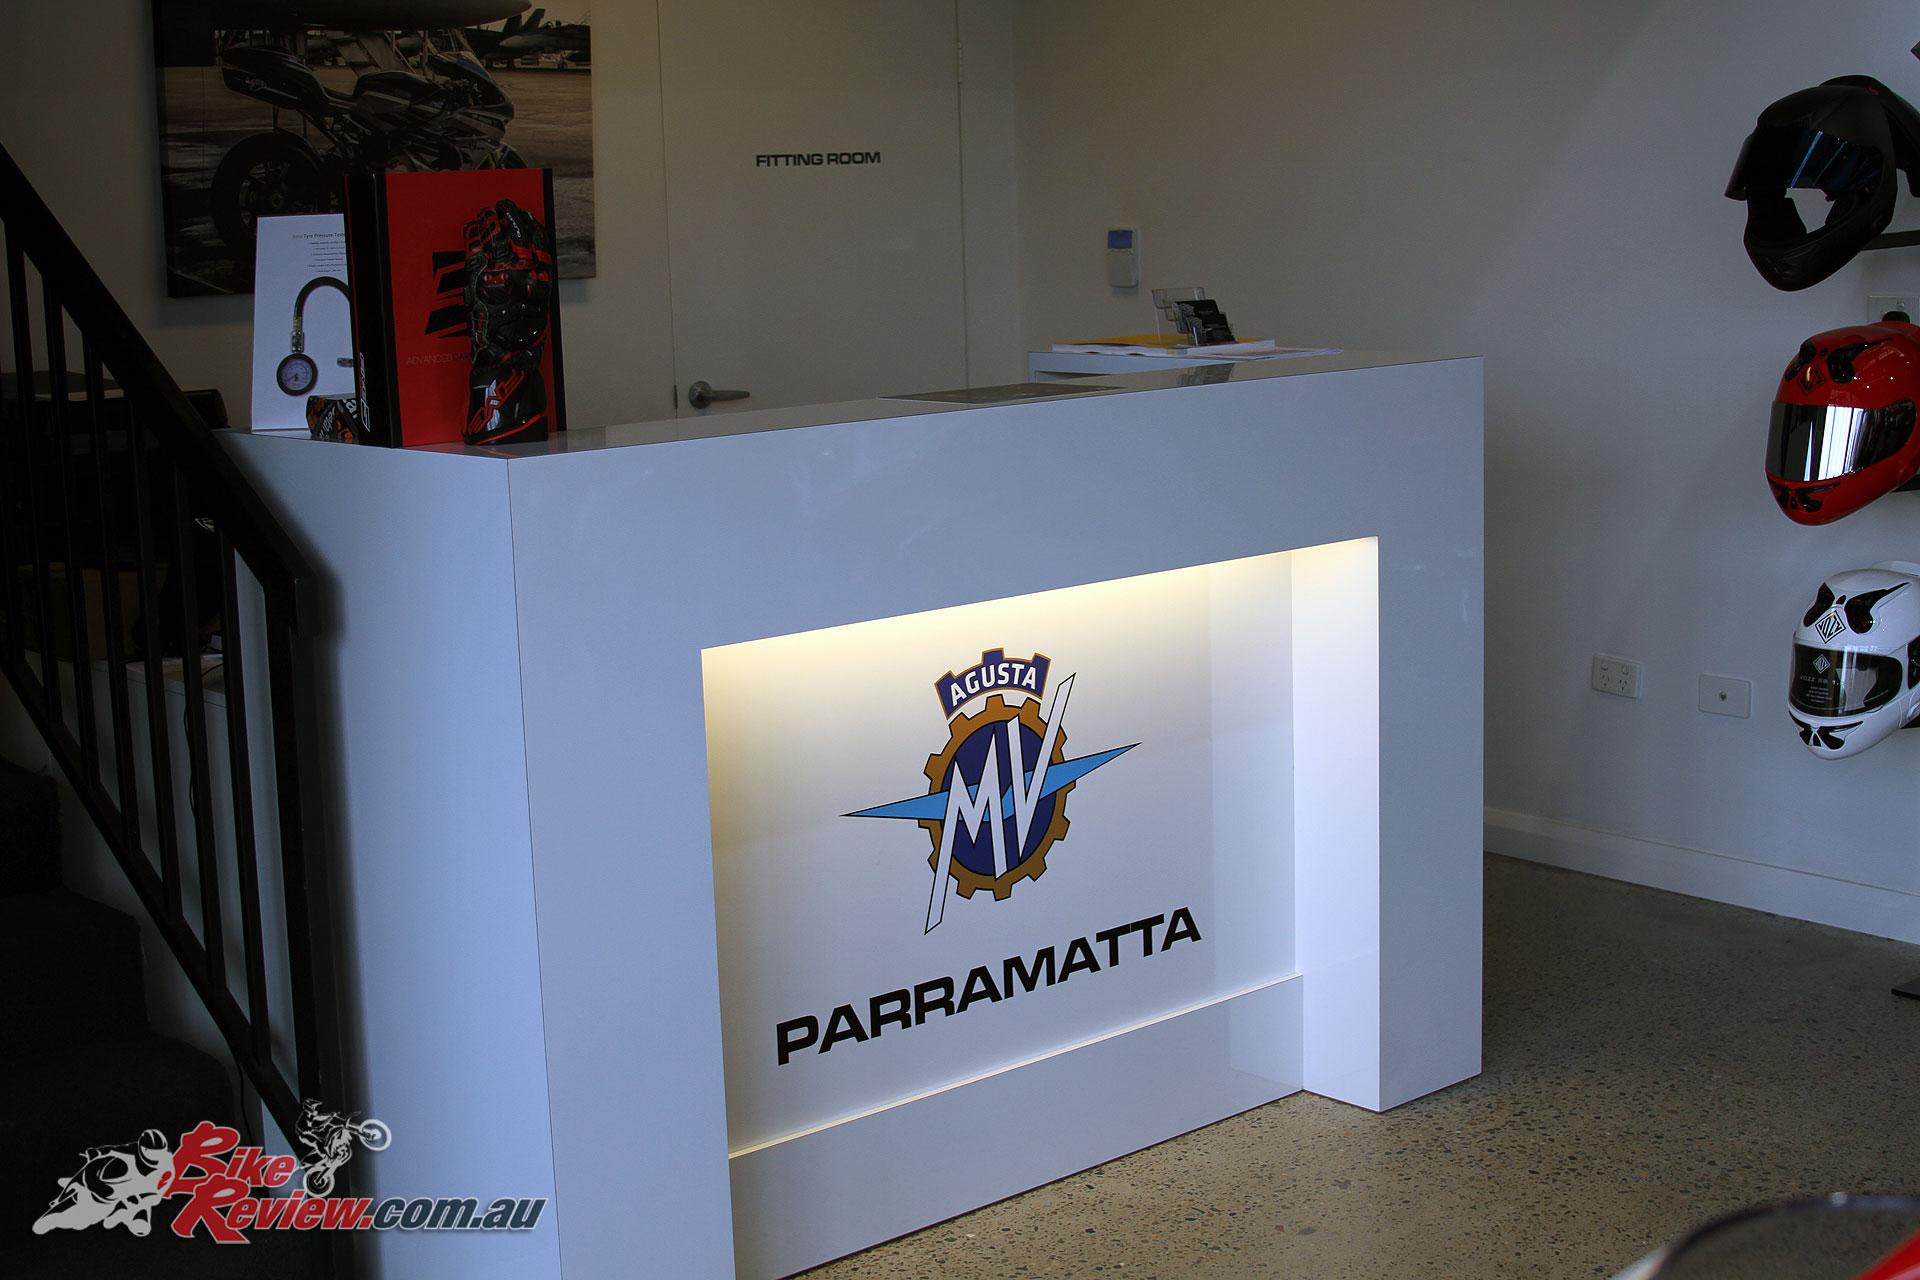 MV Agusta Parramatta